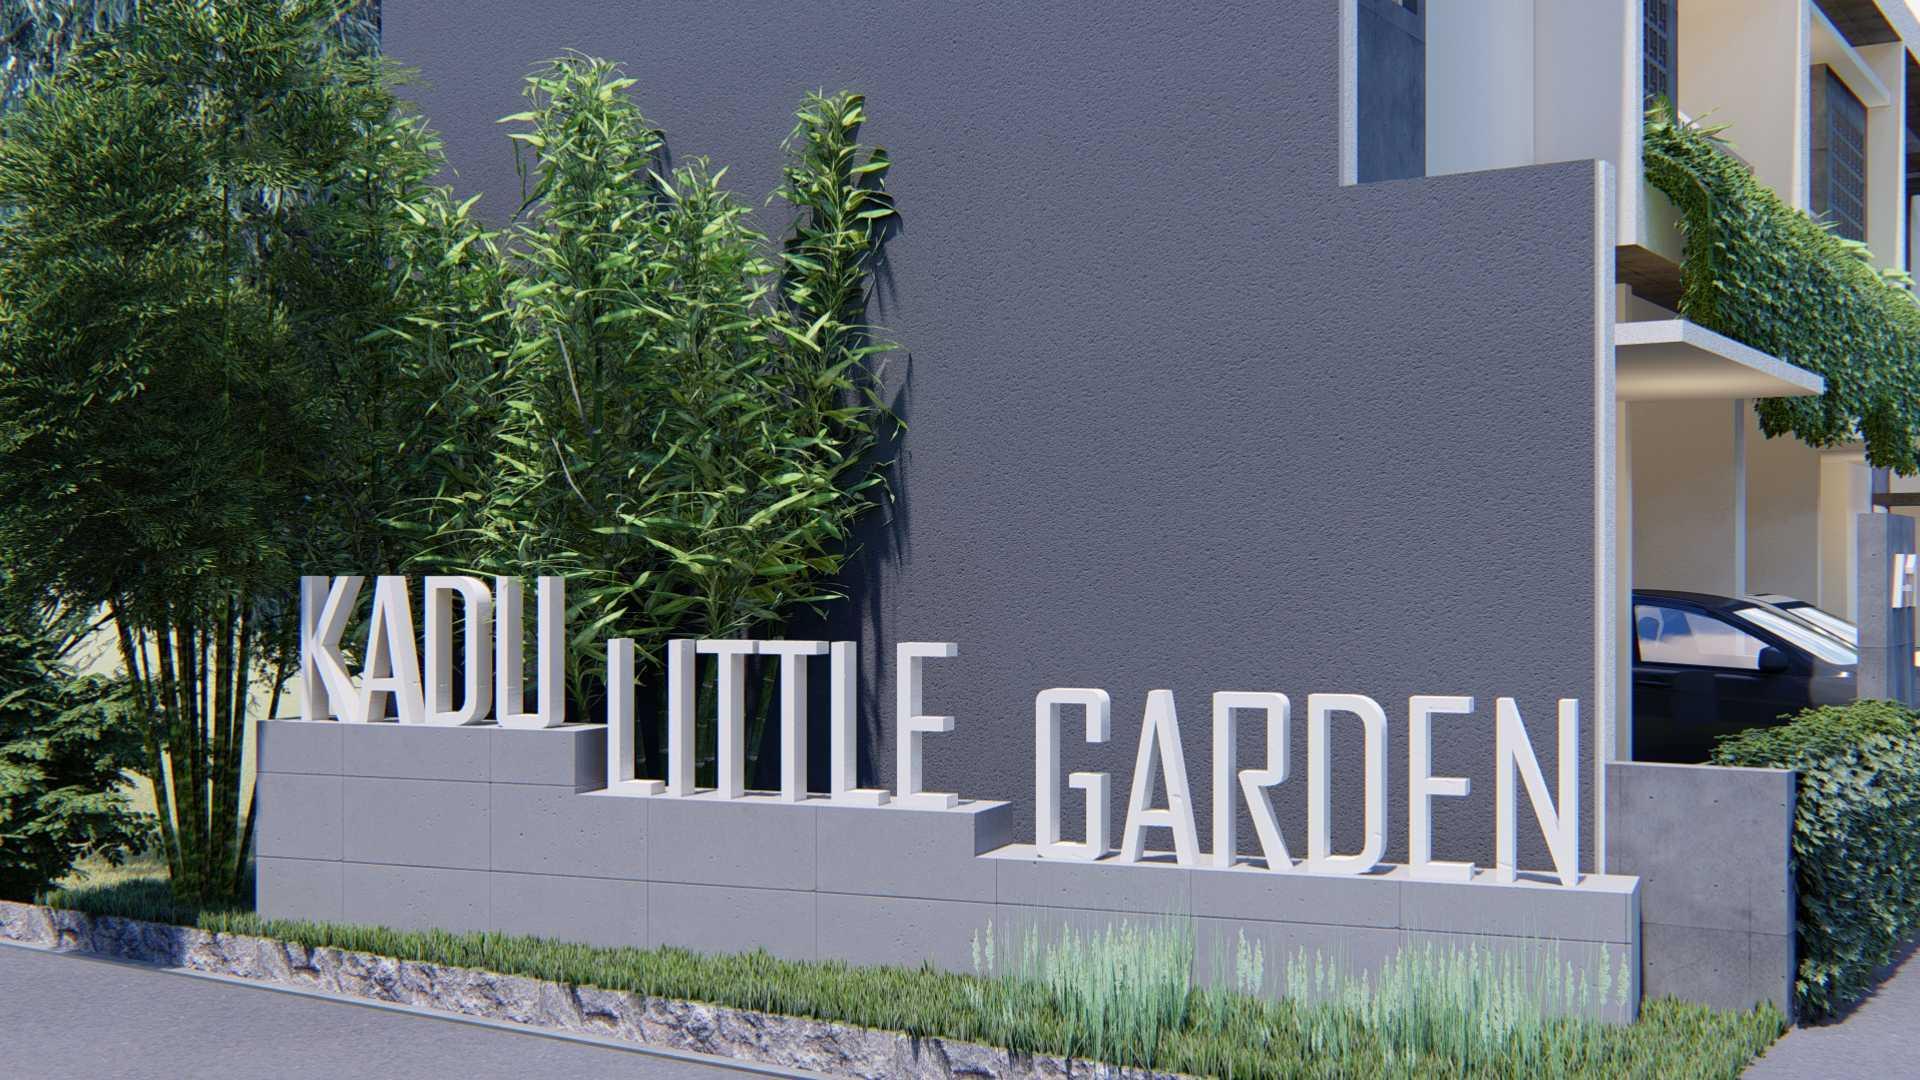 Alfath Archibim Studio Kadu Little Garden Kec. Cikupa, Tangerang, Banten, Indonesia Kec. Cikupa, Tangerang, Banten, Indonesia Alfath-Archibim-Studio-Kadu-Little-Garden  <P>Bagian Entrance Perumahan.&nbsp;</p> 112126